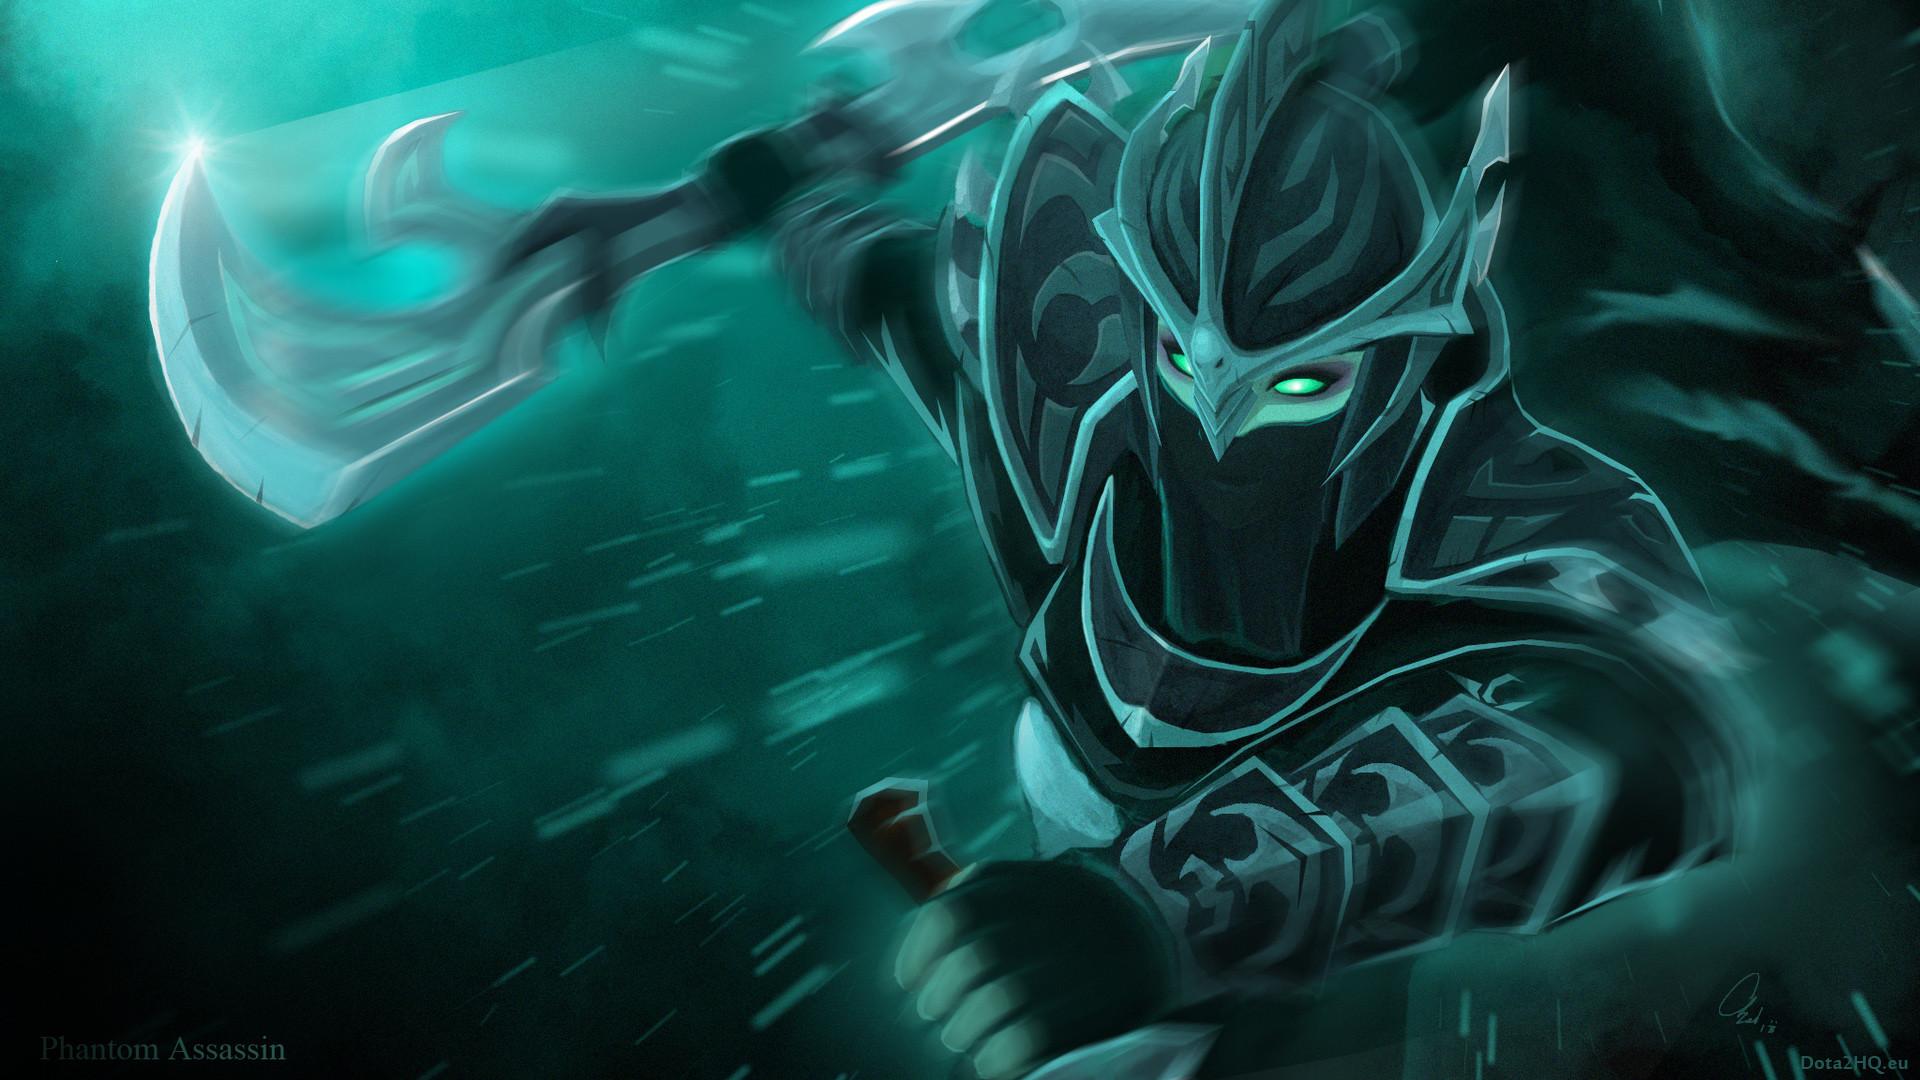 Stylish phantom assassin dota 2 art 78 HD Anime Wallpaper Â« Kuff Games